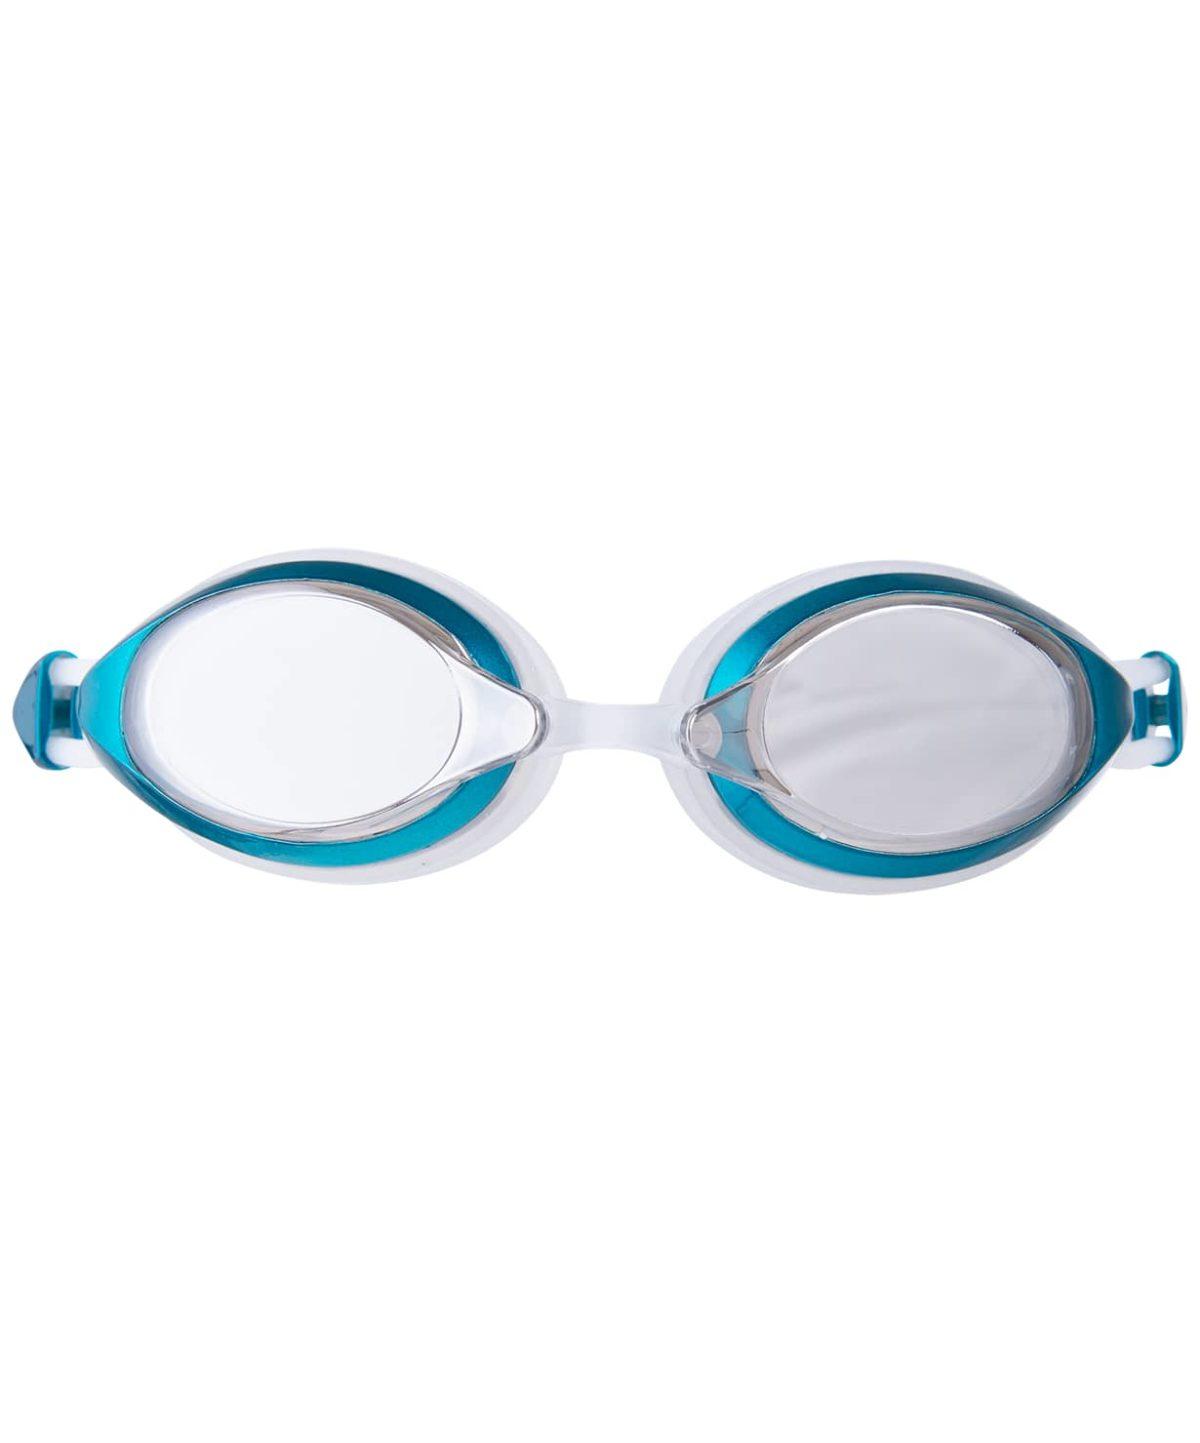 25DEGREES Pulso Mirrored White/Blue Очки для плавания  17355 - 2